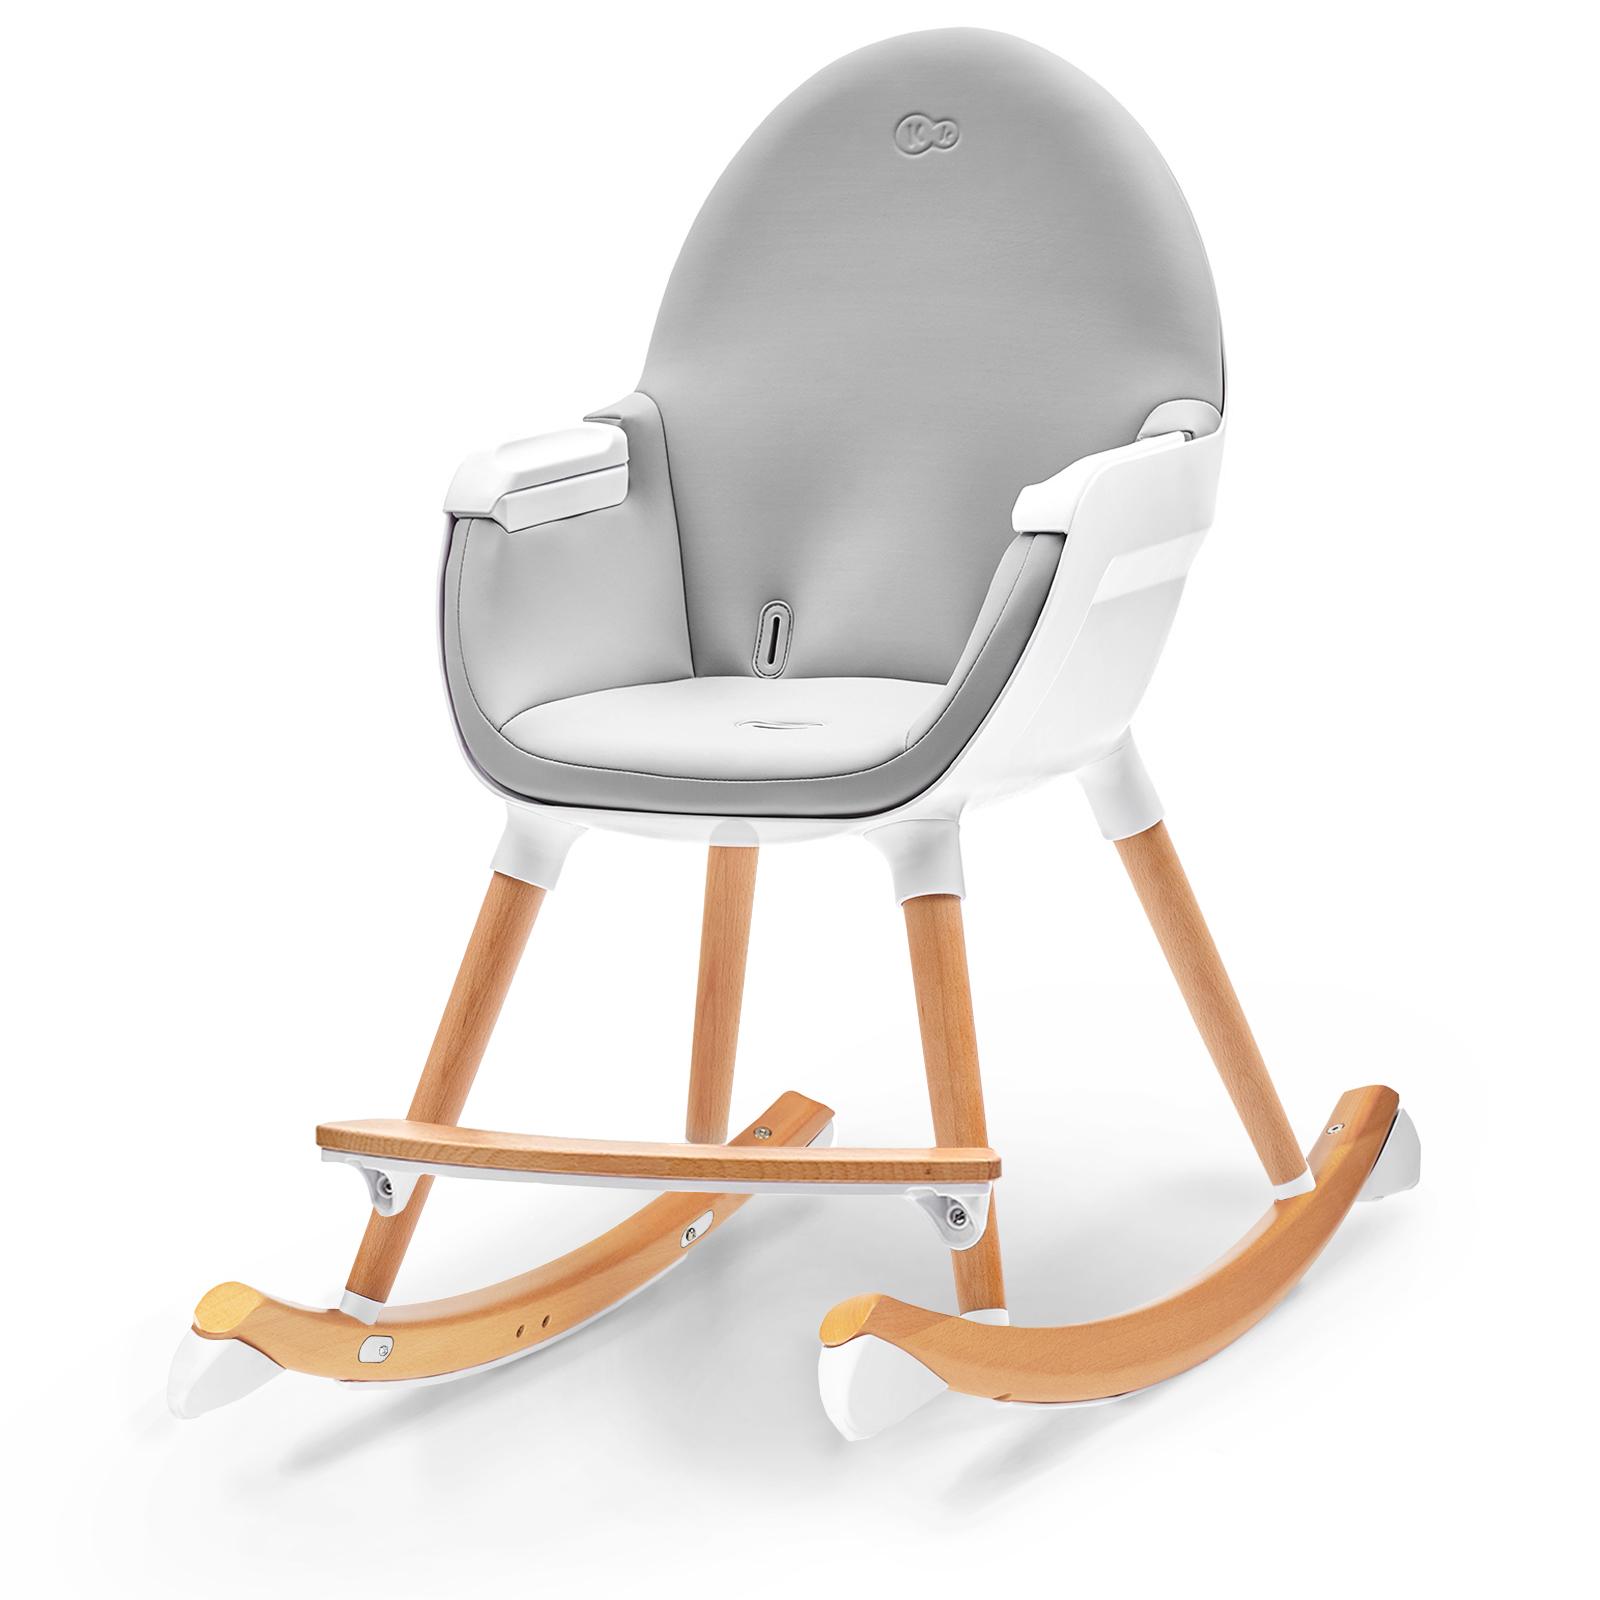 Кресло-качалка Kinderkraft high Chair от бренда Kinderkraft